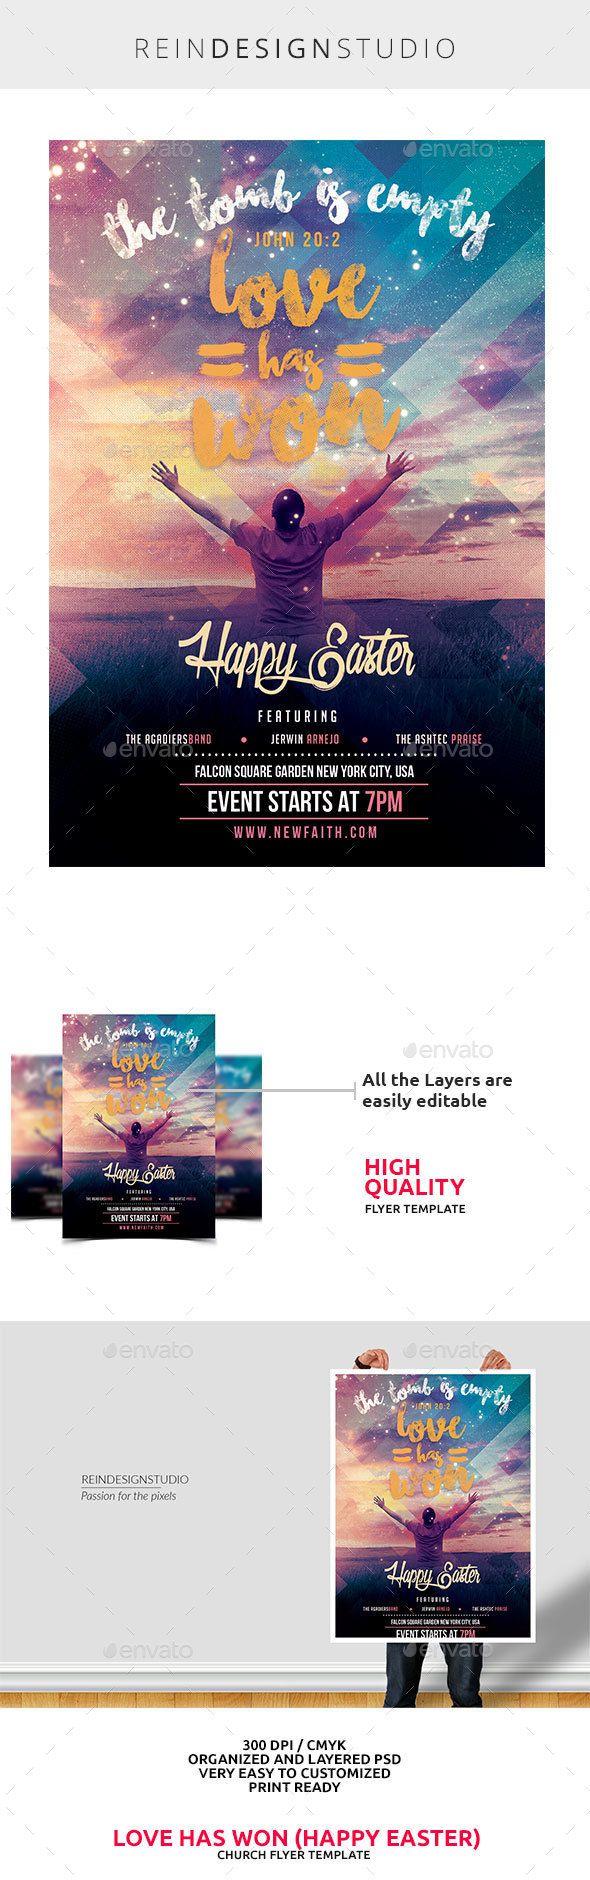 148 best church images on Pinterest   Flyer design, Flyer template ...